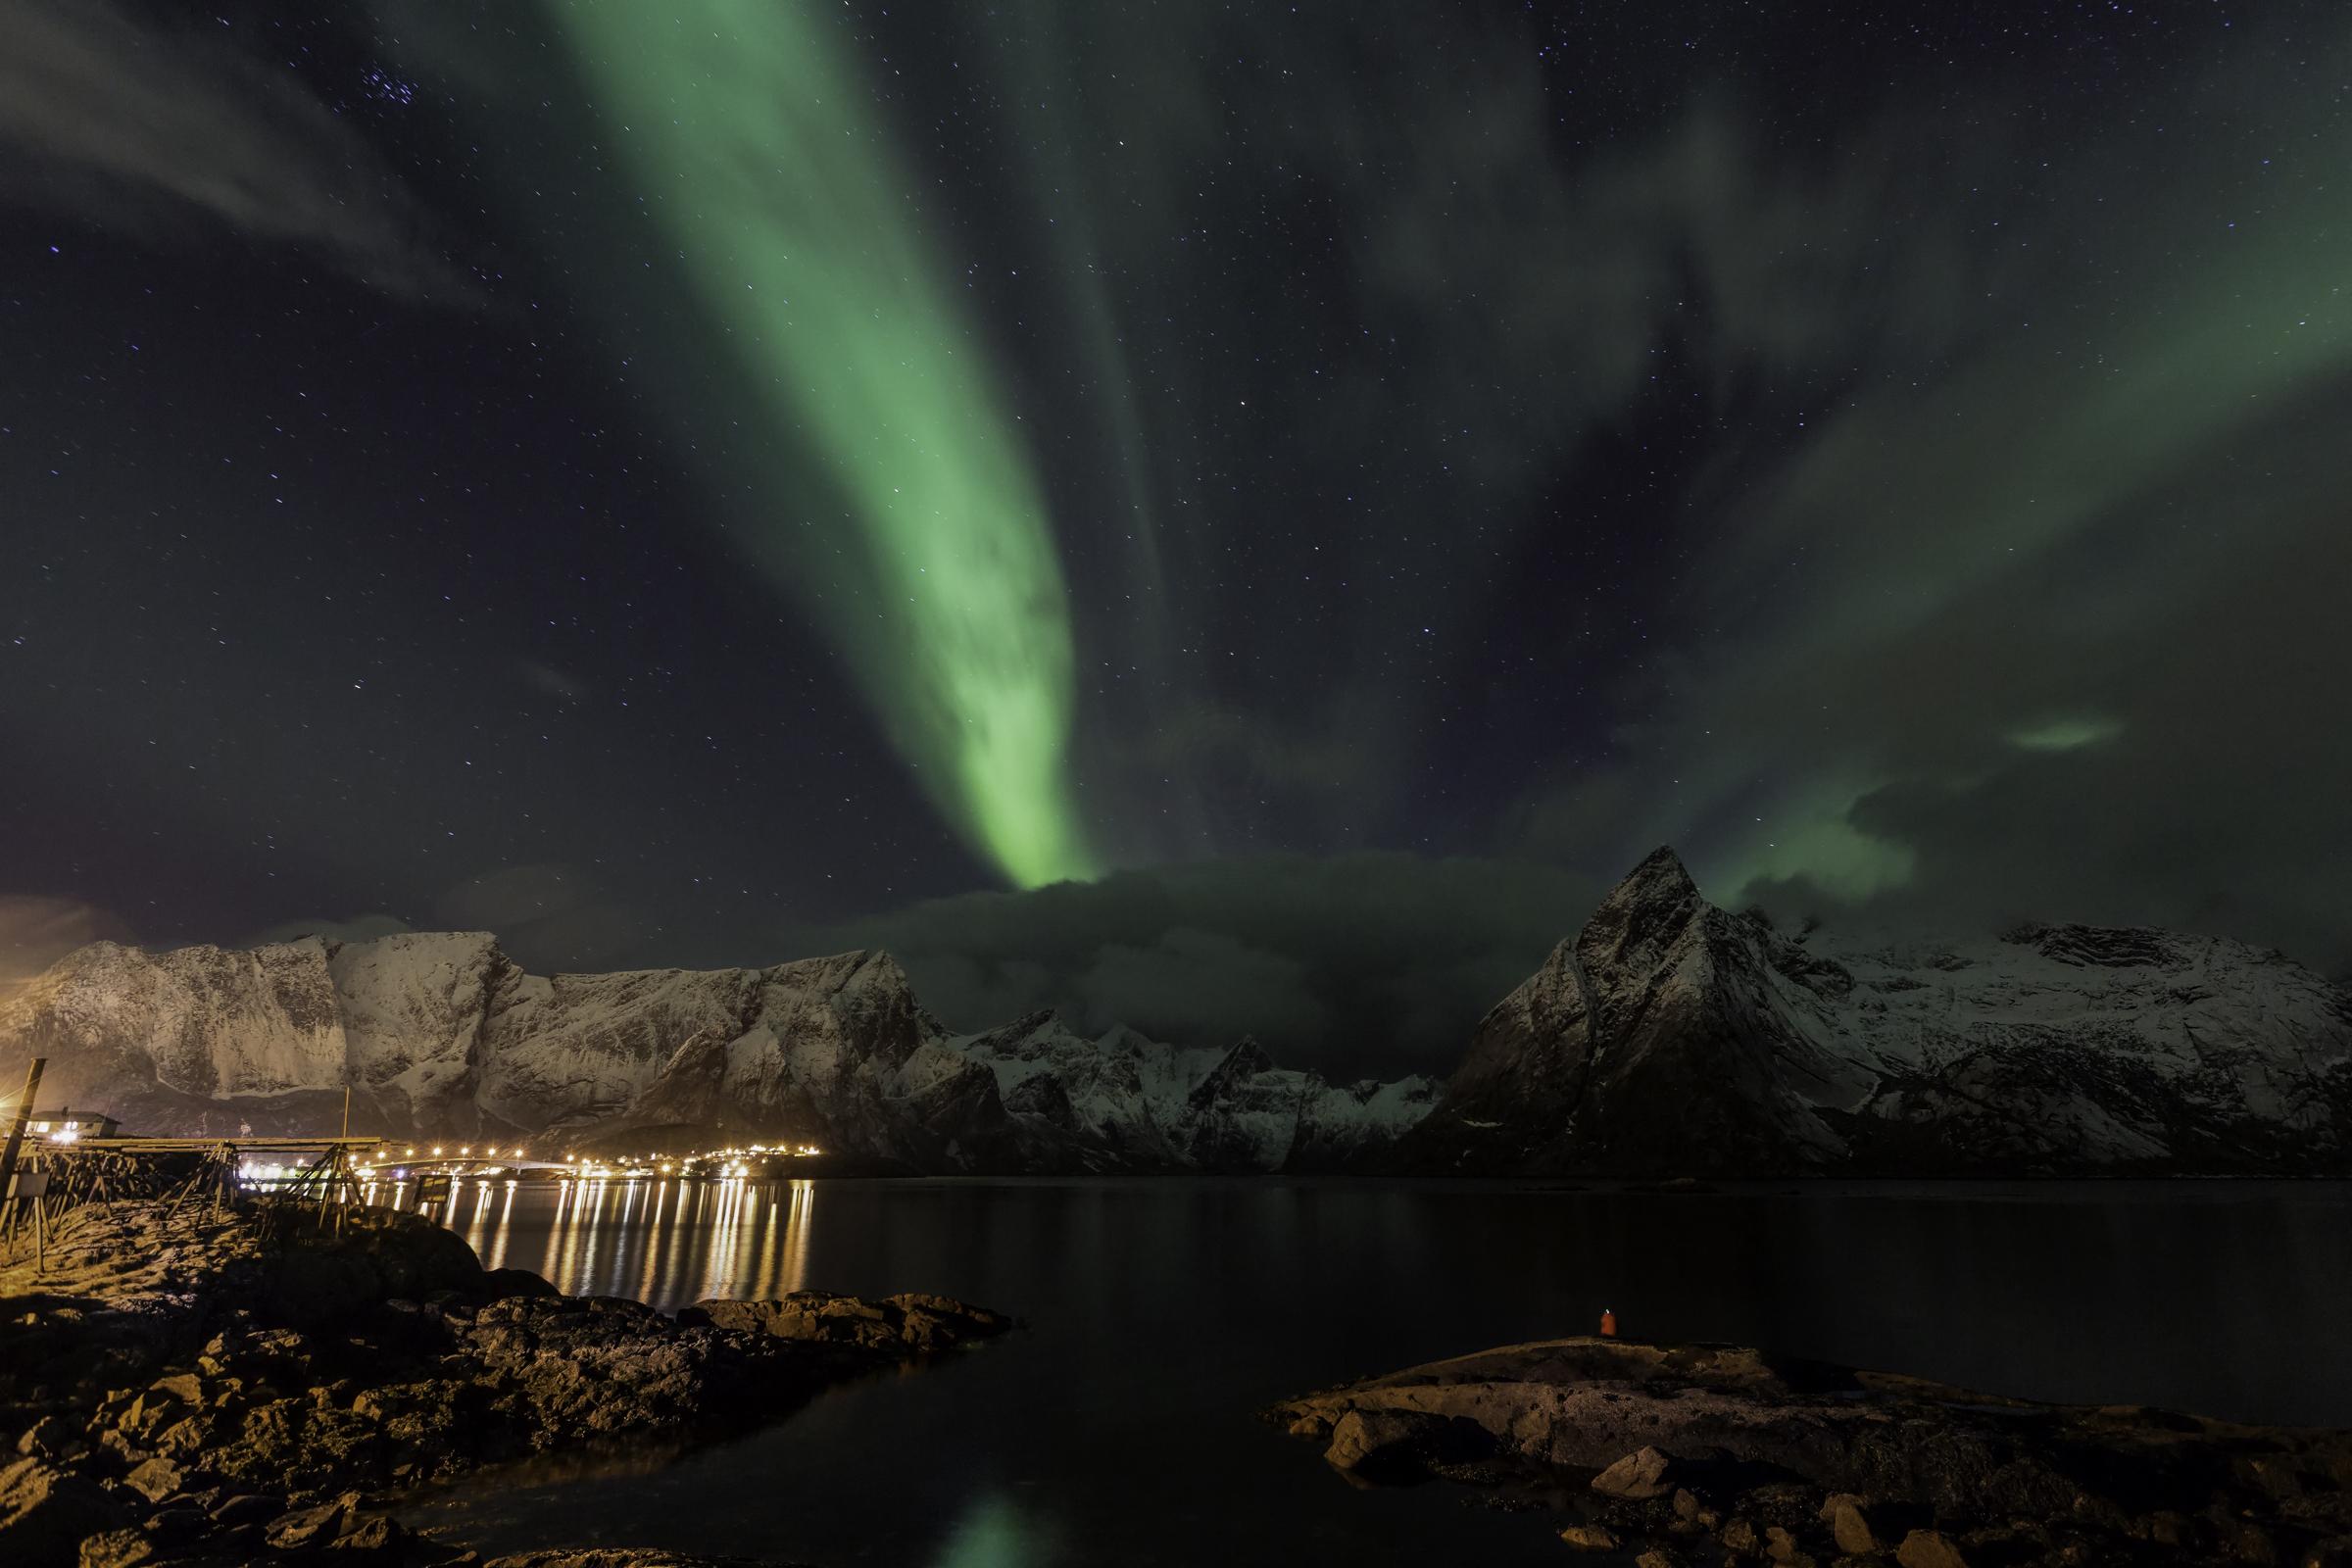 TKeyes_TKeyes_Norway~0020-2.jpg